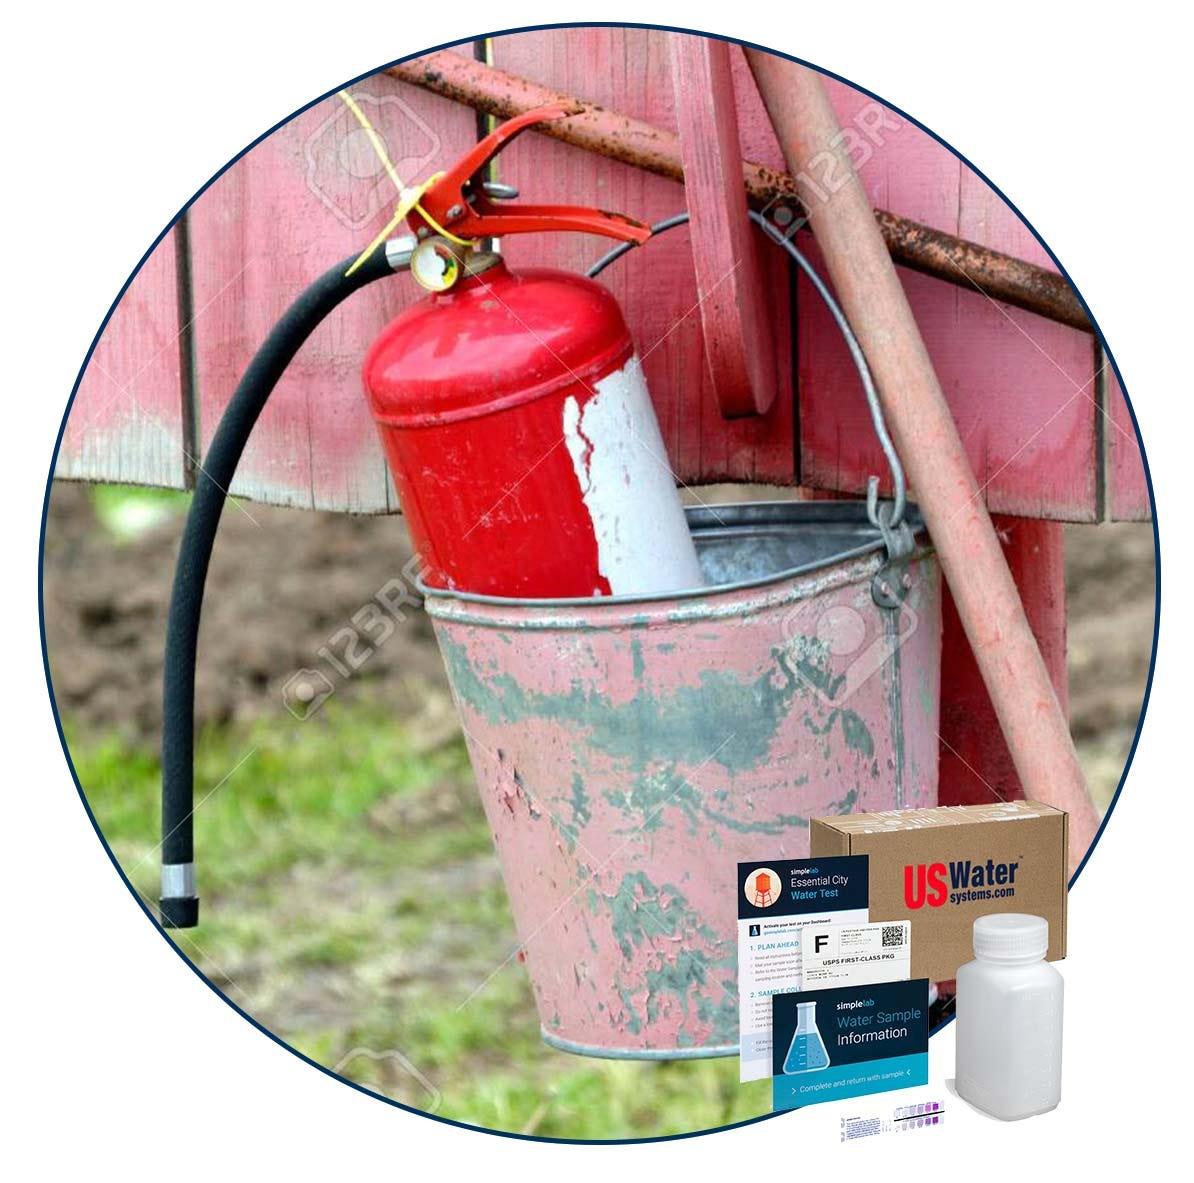 PFAS water test